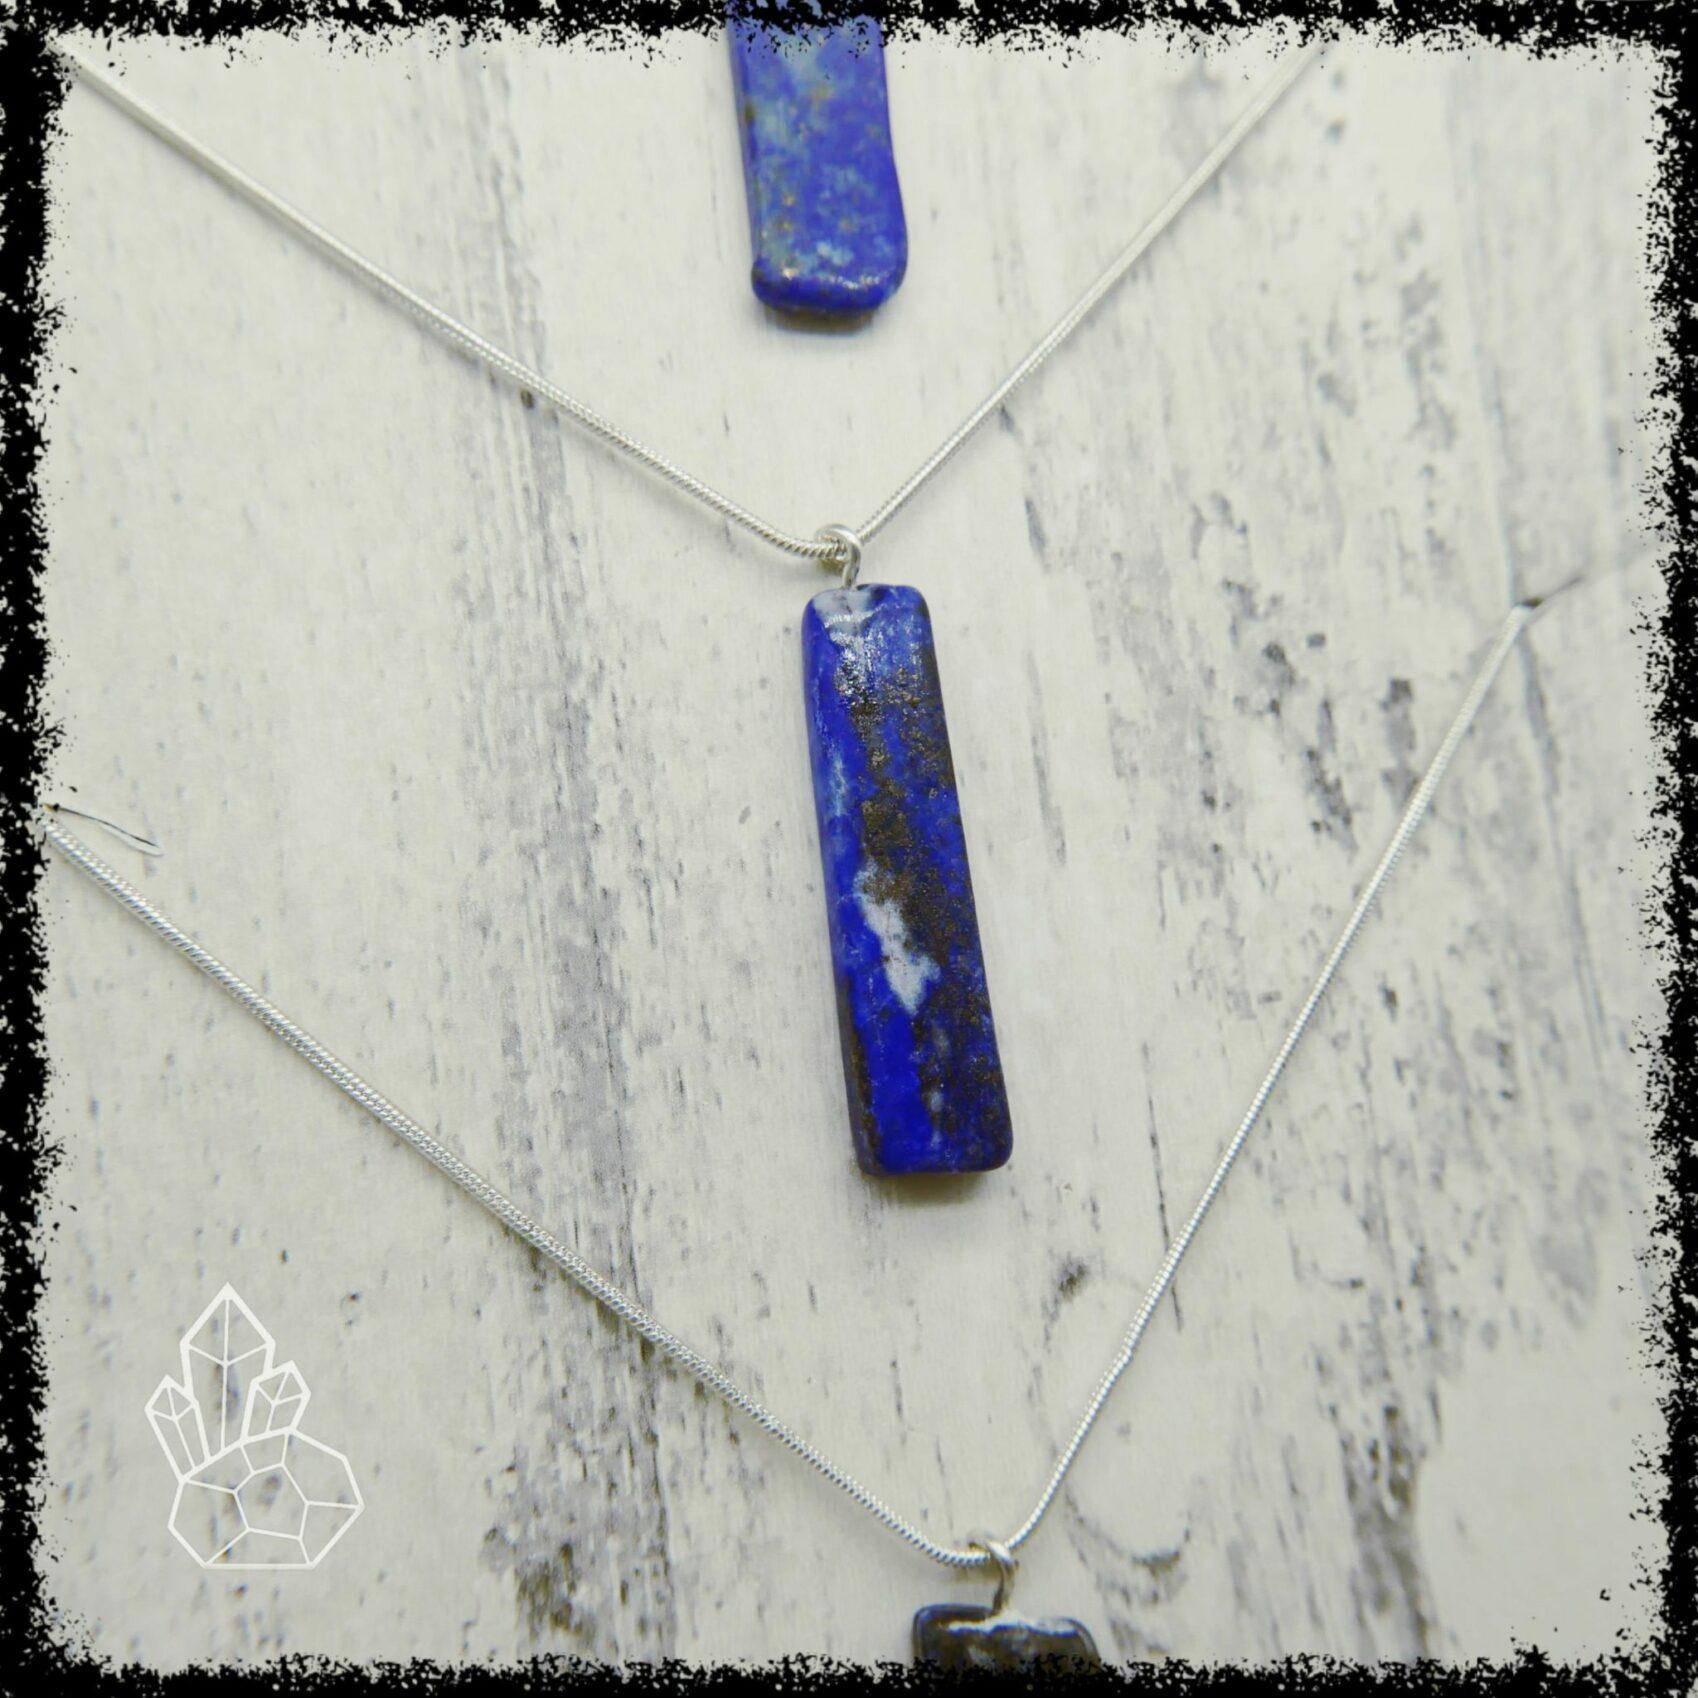 Lapis Lazuli Necklace  Lapis Lazuli Pendant  September Birthstone Necklace  Libra Necklace  Libra Jewelry  Lapis Lazuli Jewelry